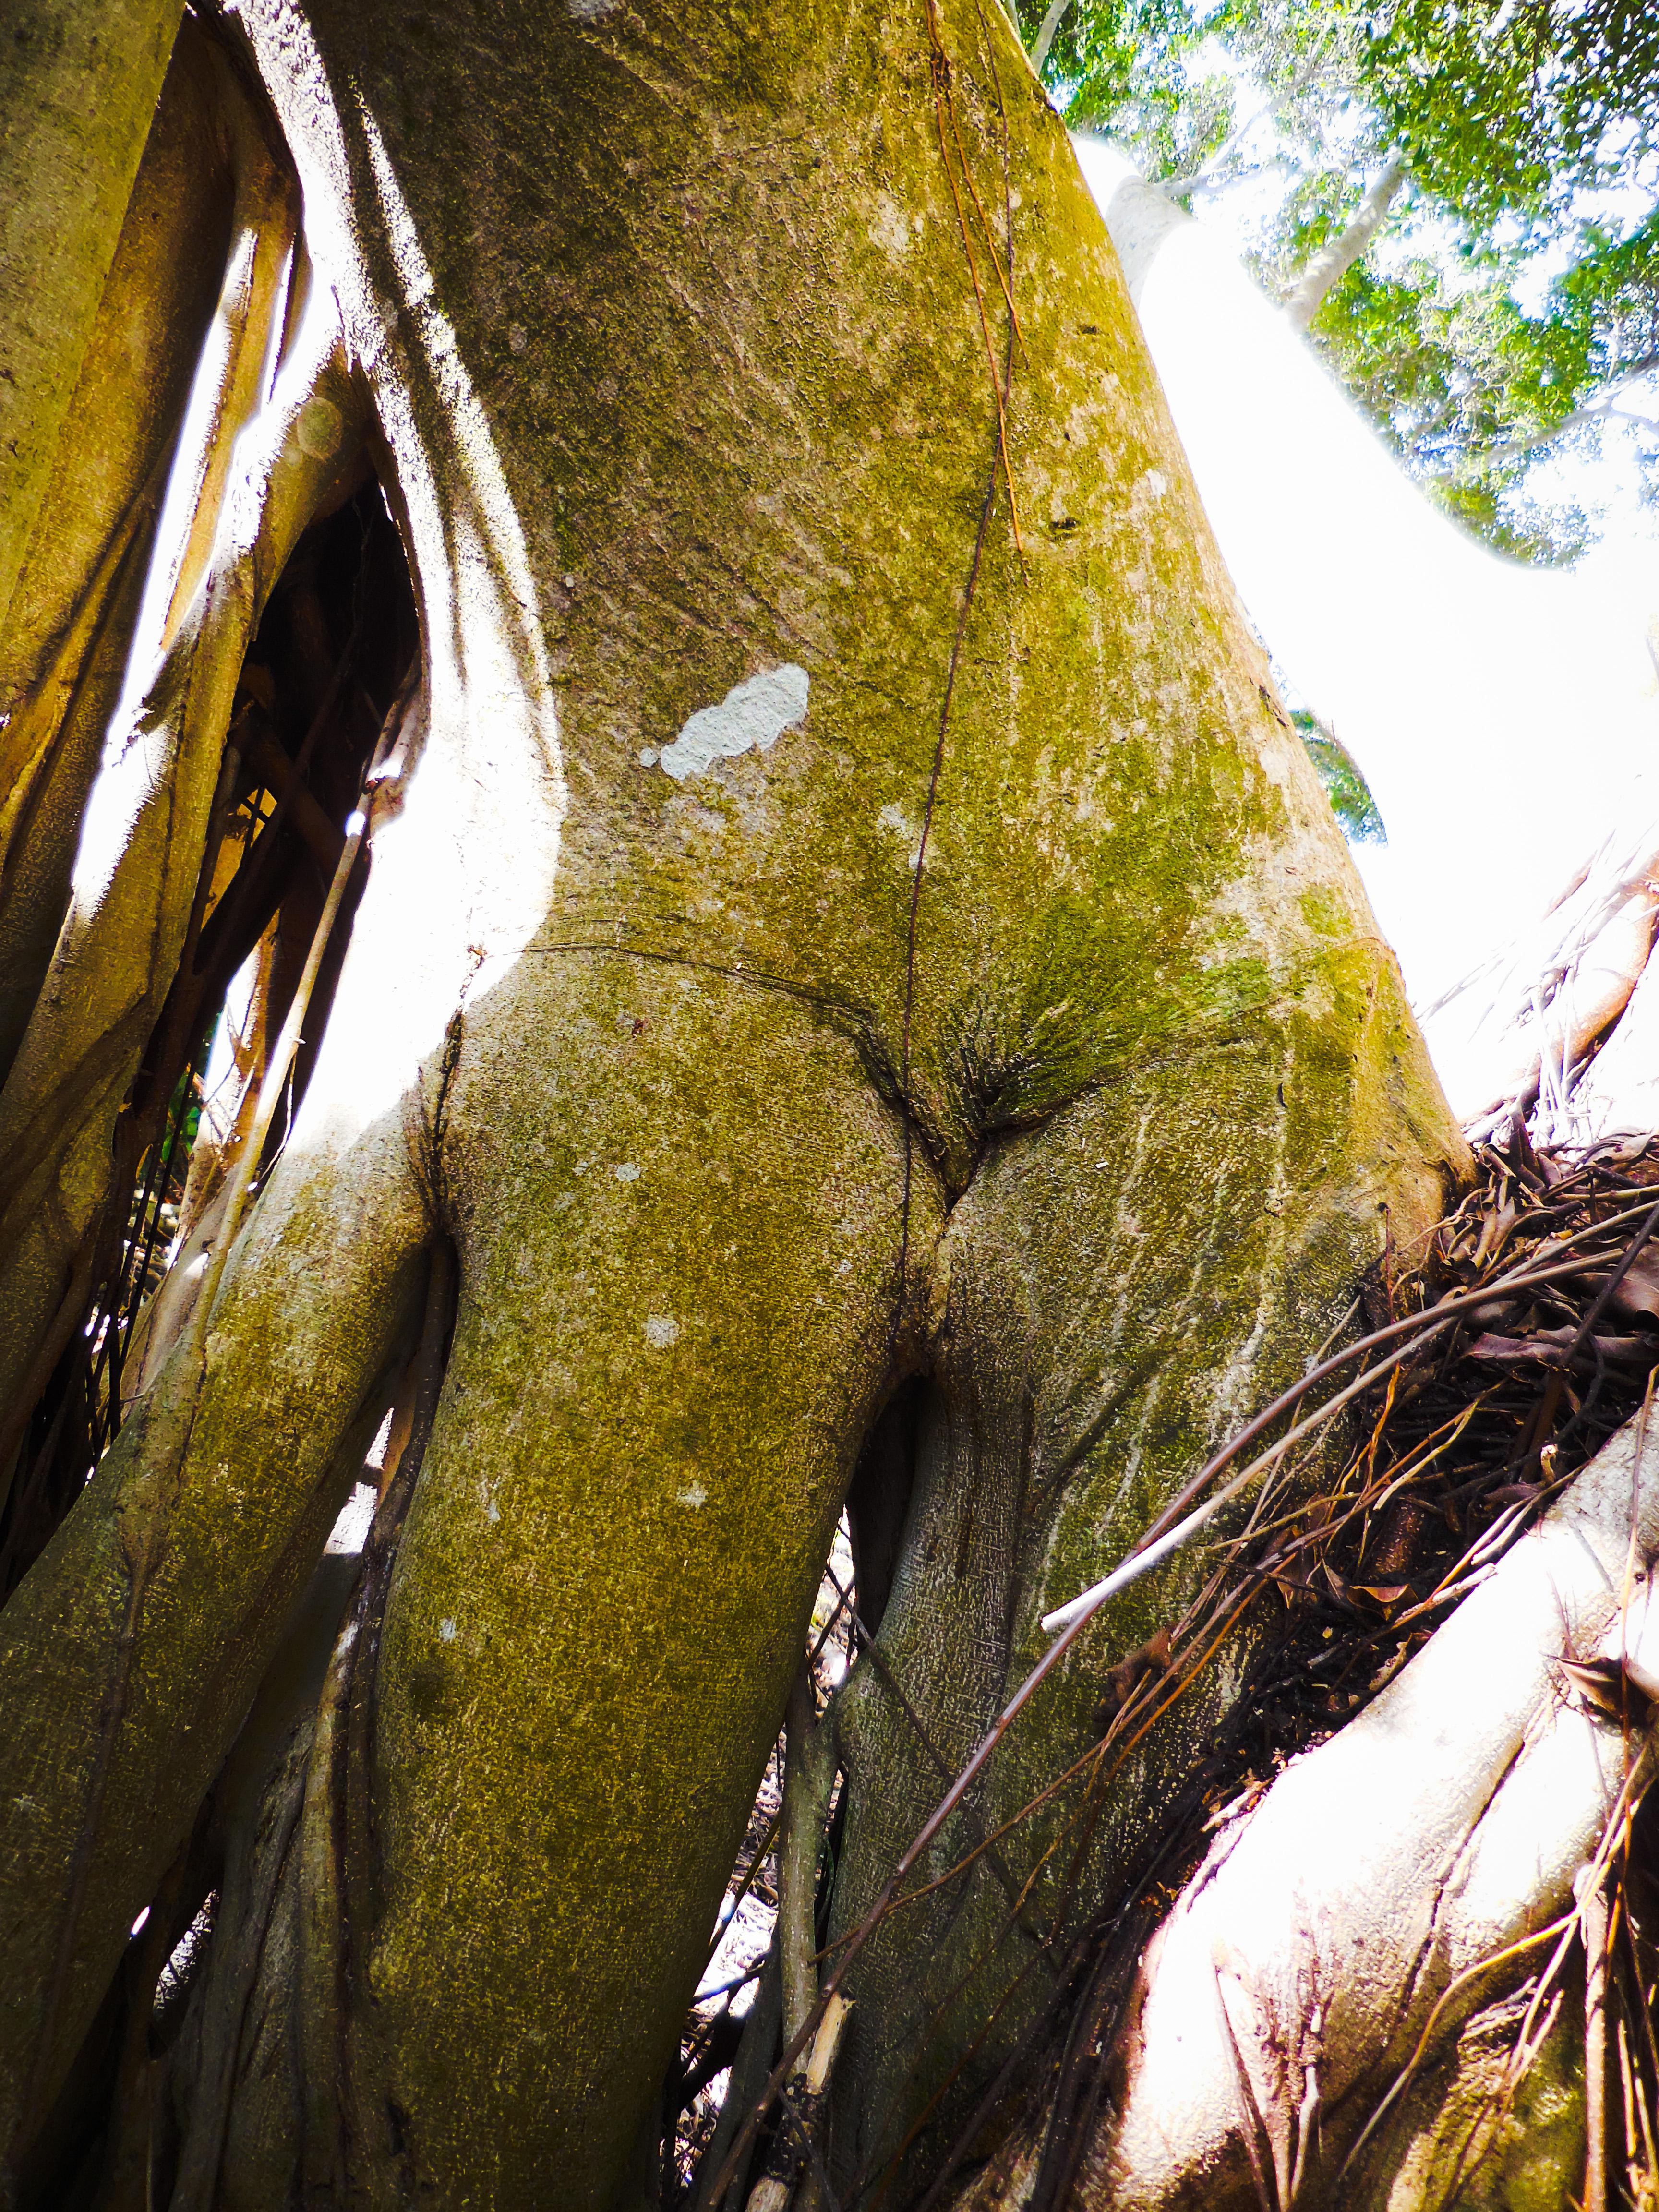 Banyon Erotica #5